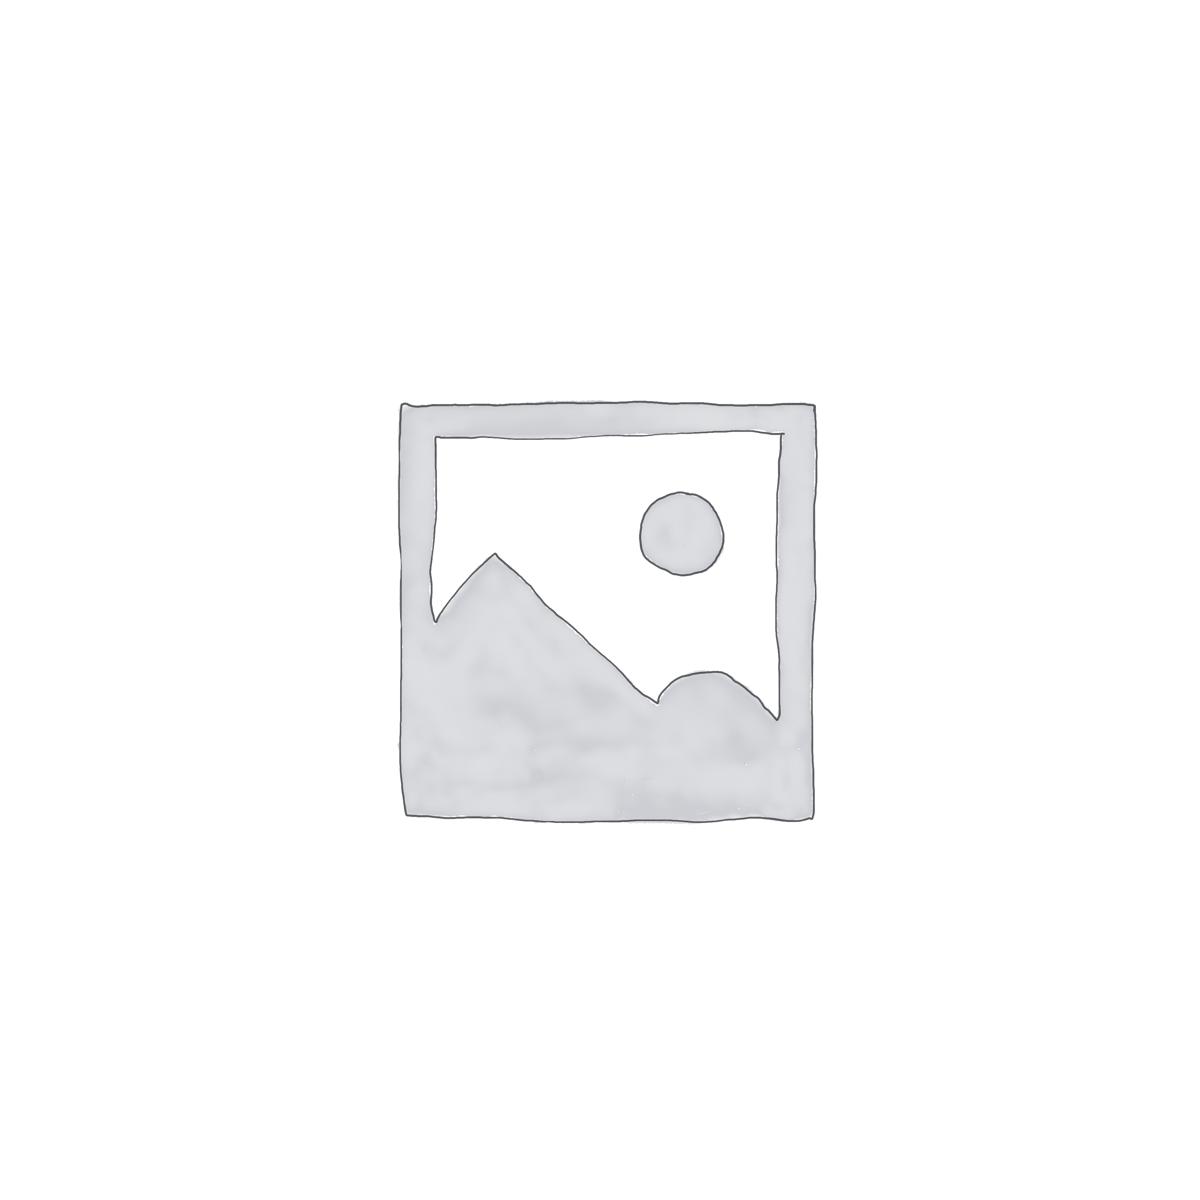 woocommerce placeholder - woocommerce-placeholder